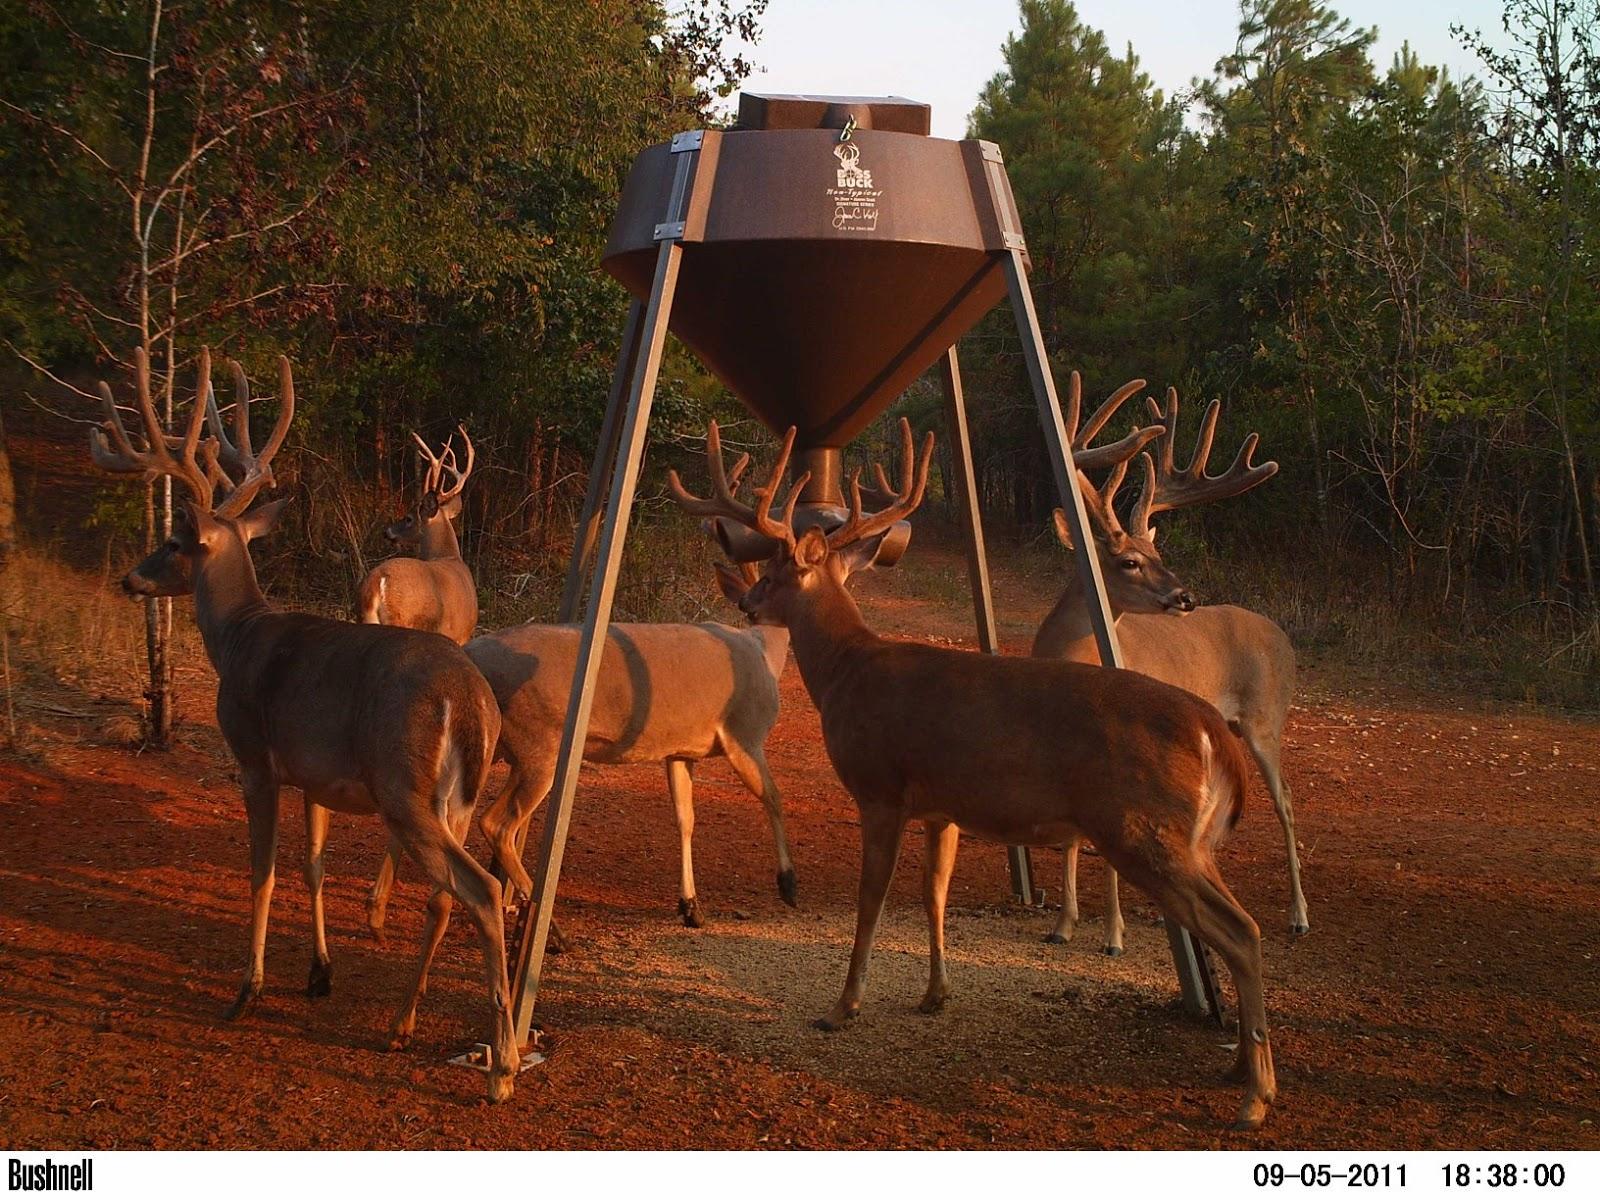 Boss Buck Deer Feeders and Blinds: Welcome to the Boss Buck